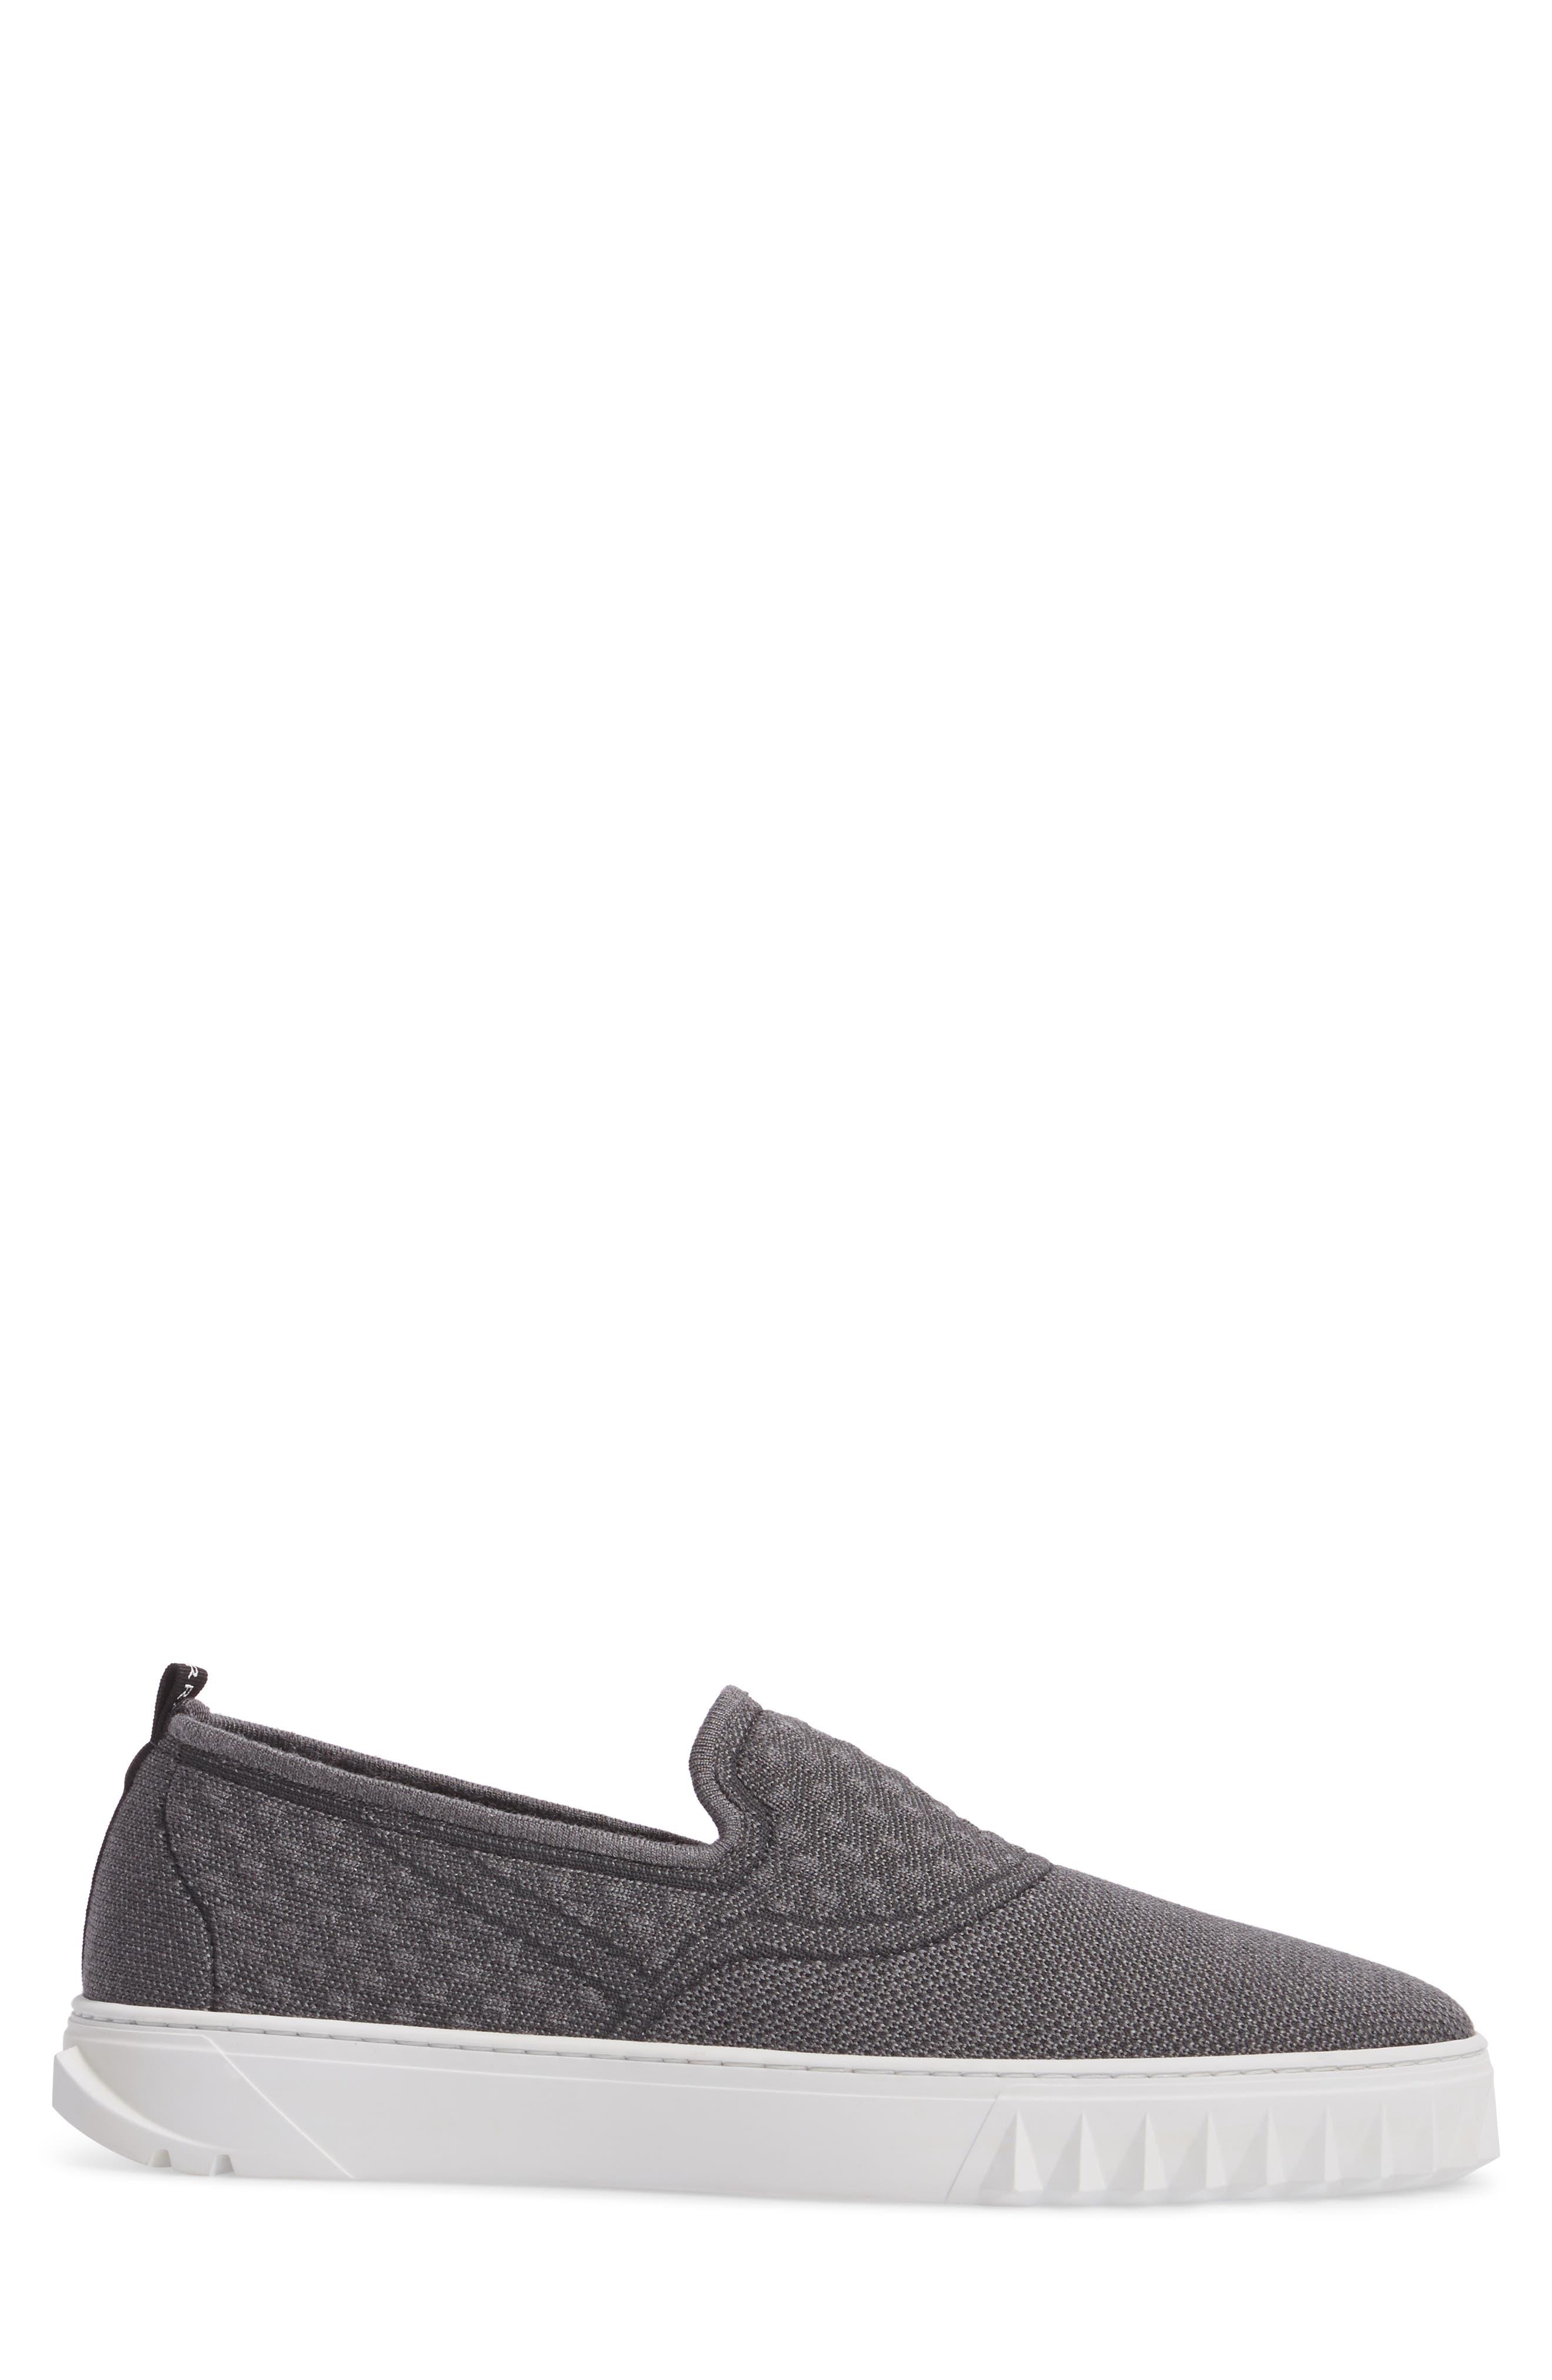 Clay Slip-On Sneaker,                             Alternate thumbnail 3, color,                             022